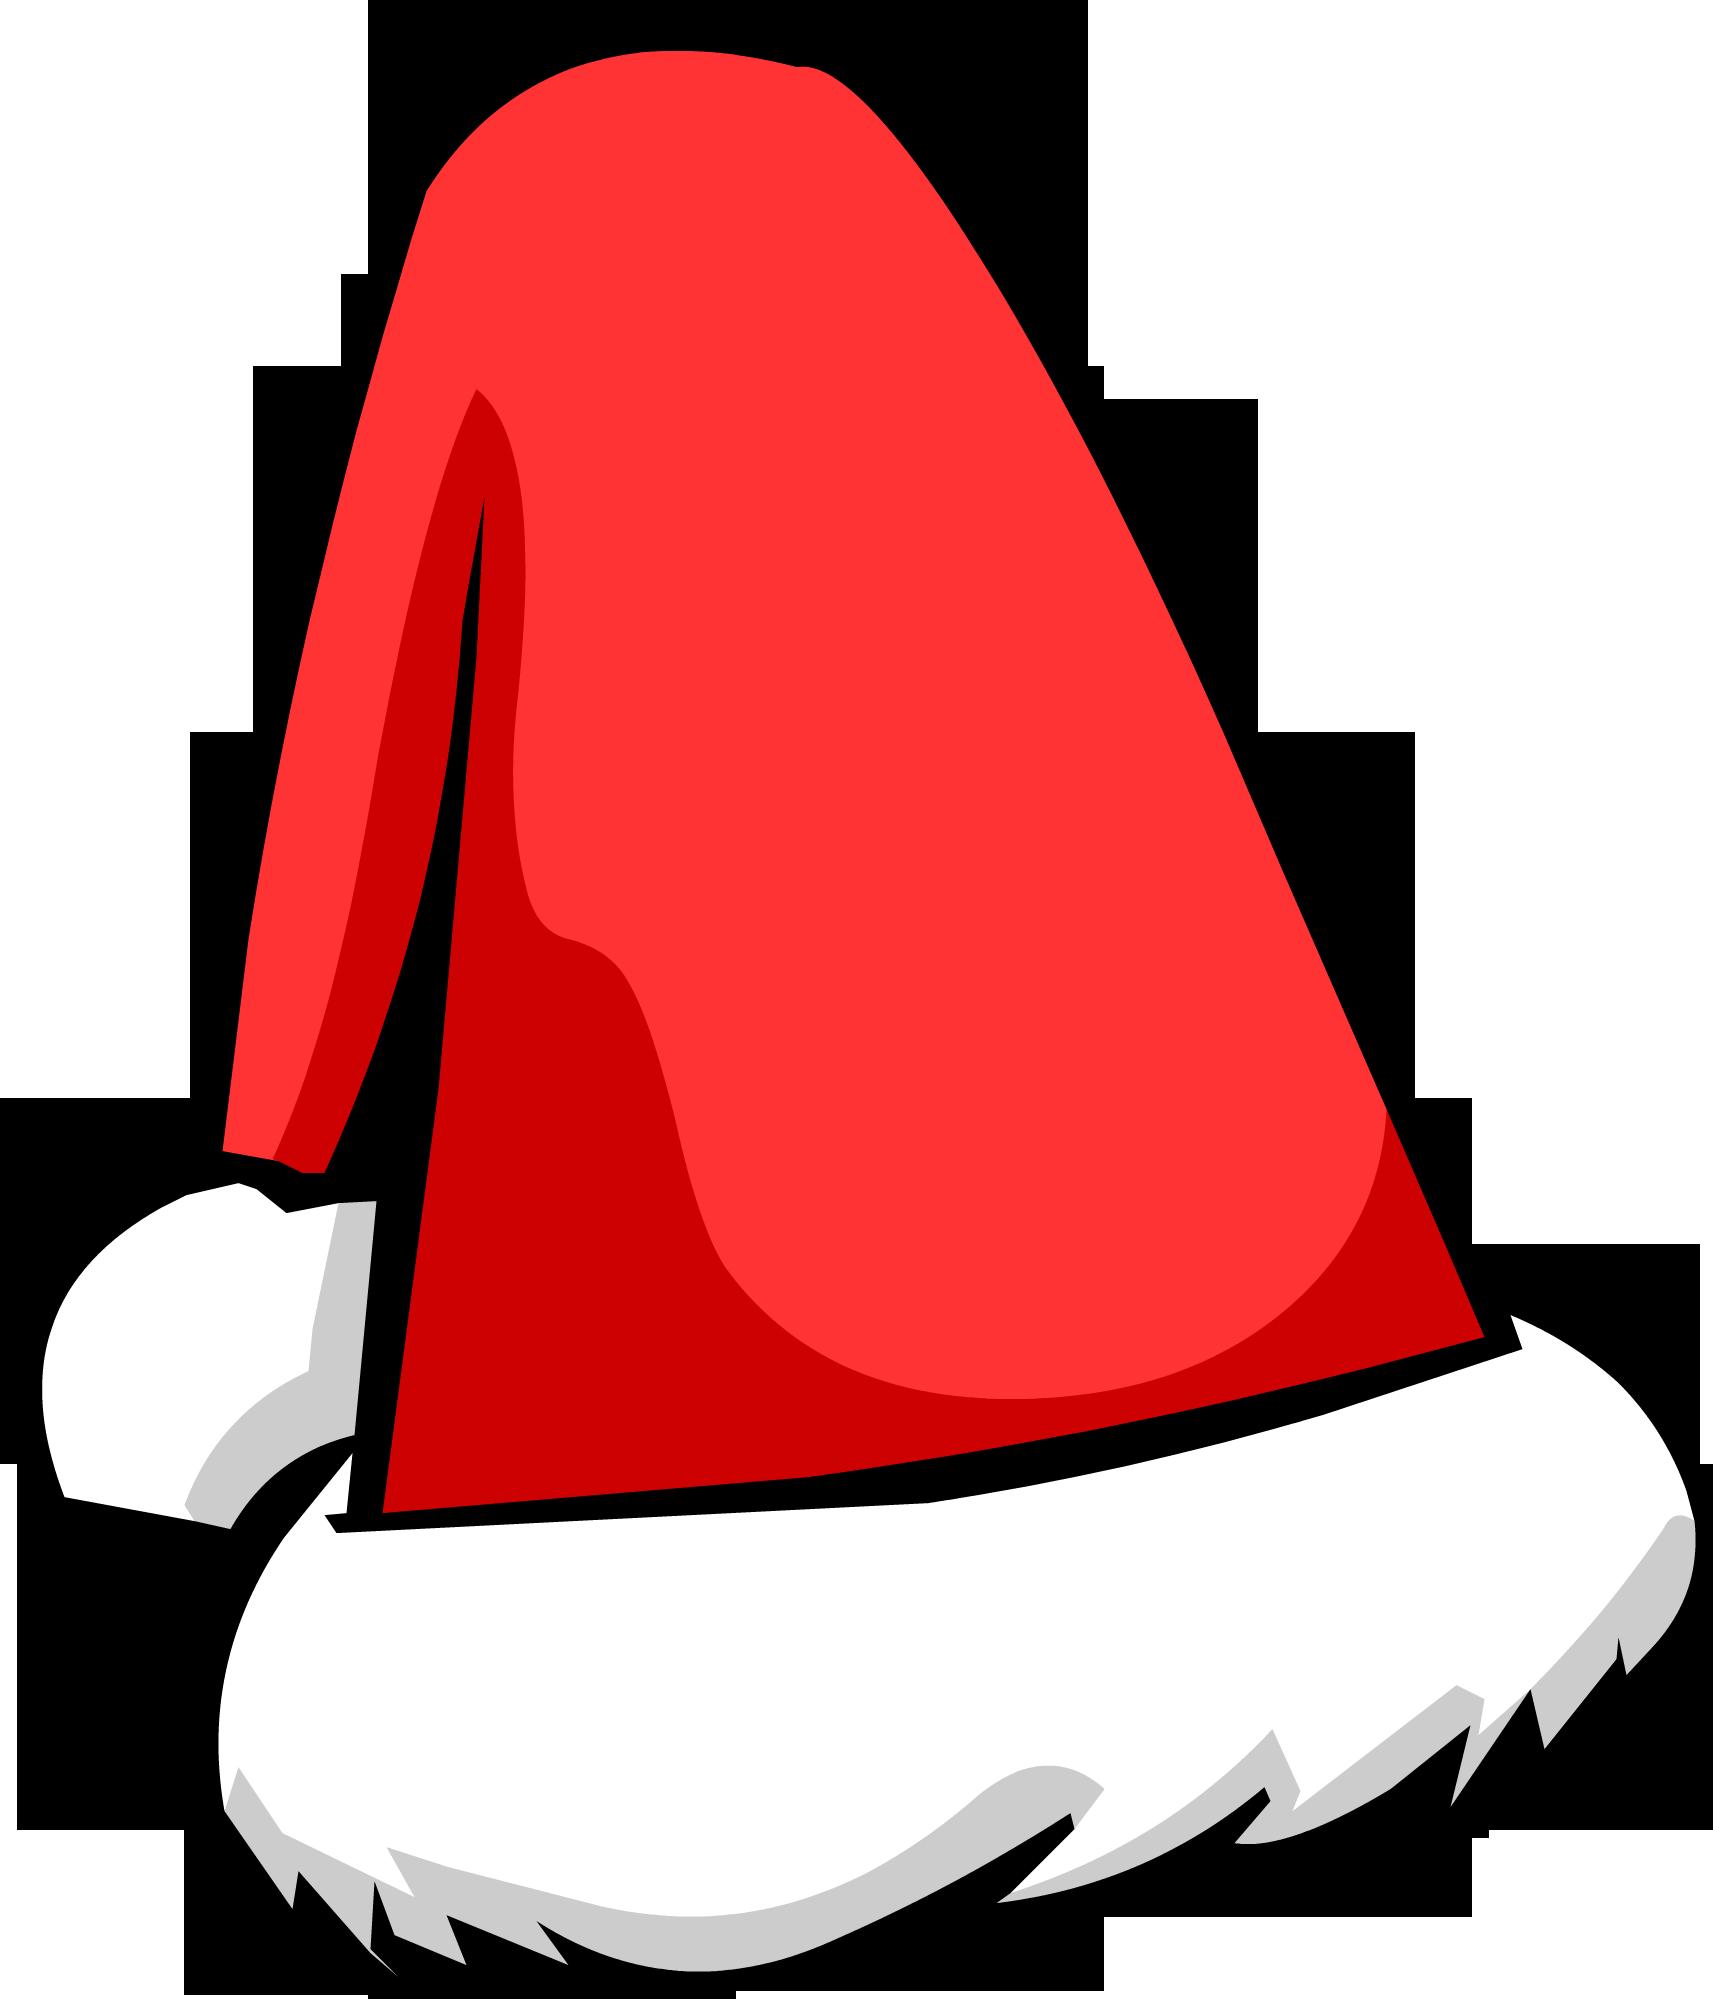 Gorro de Santa Claus (ID 414)